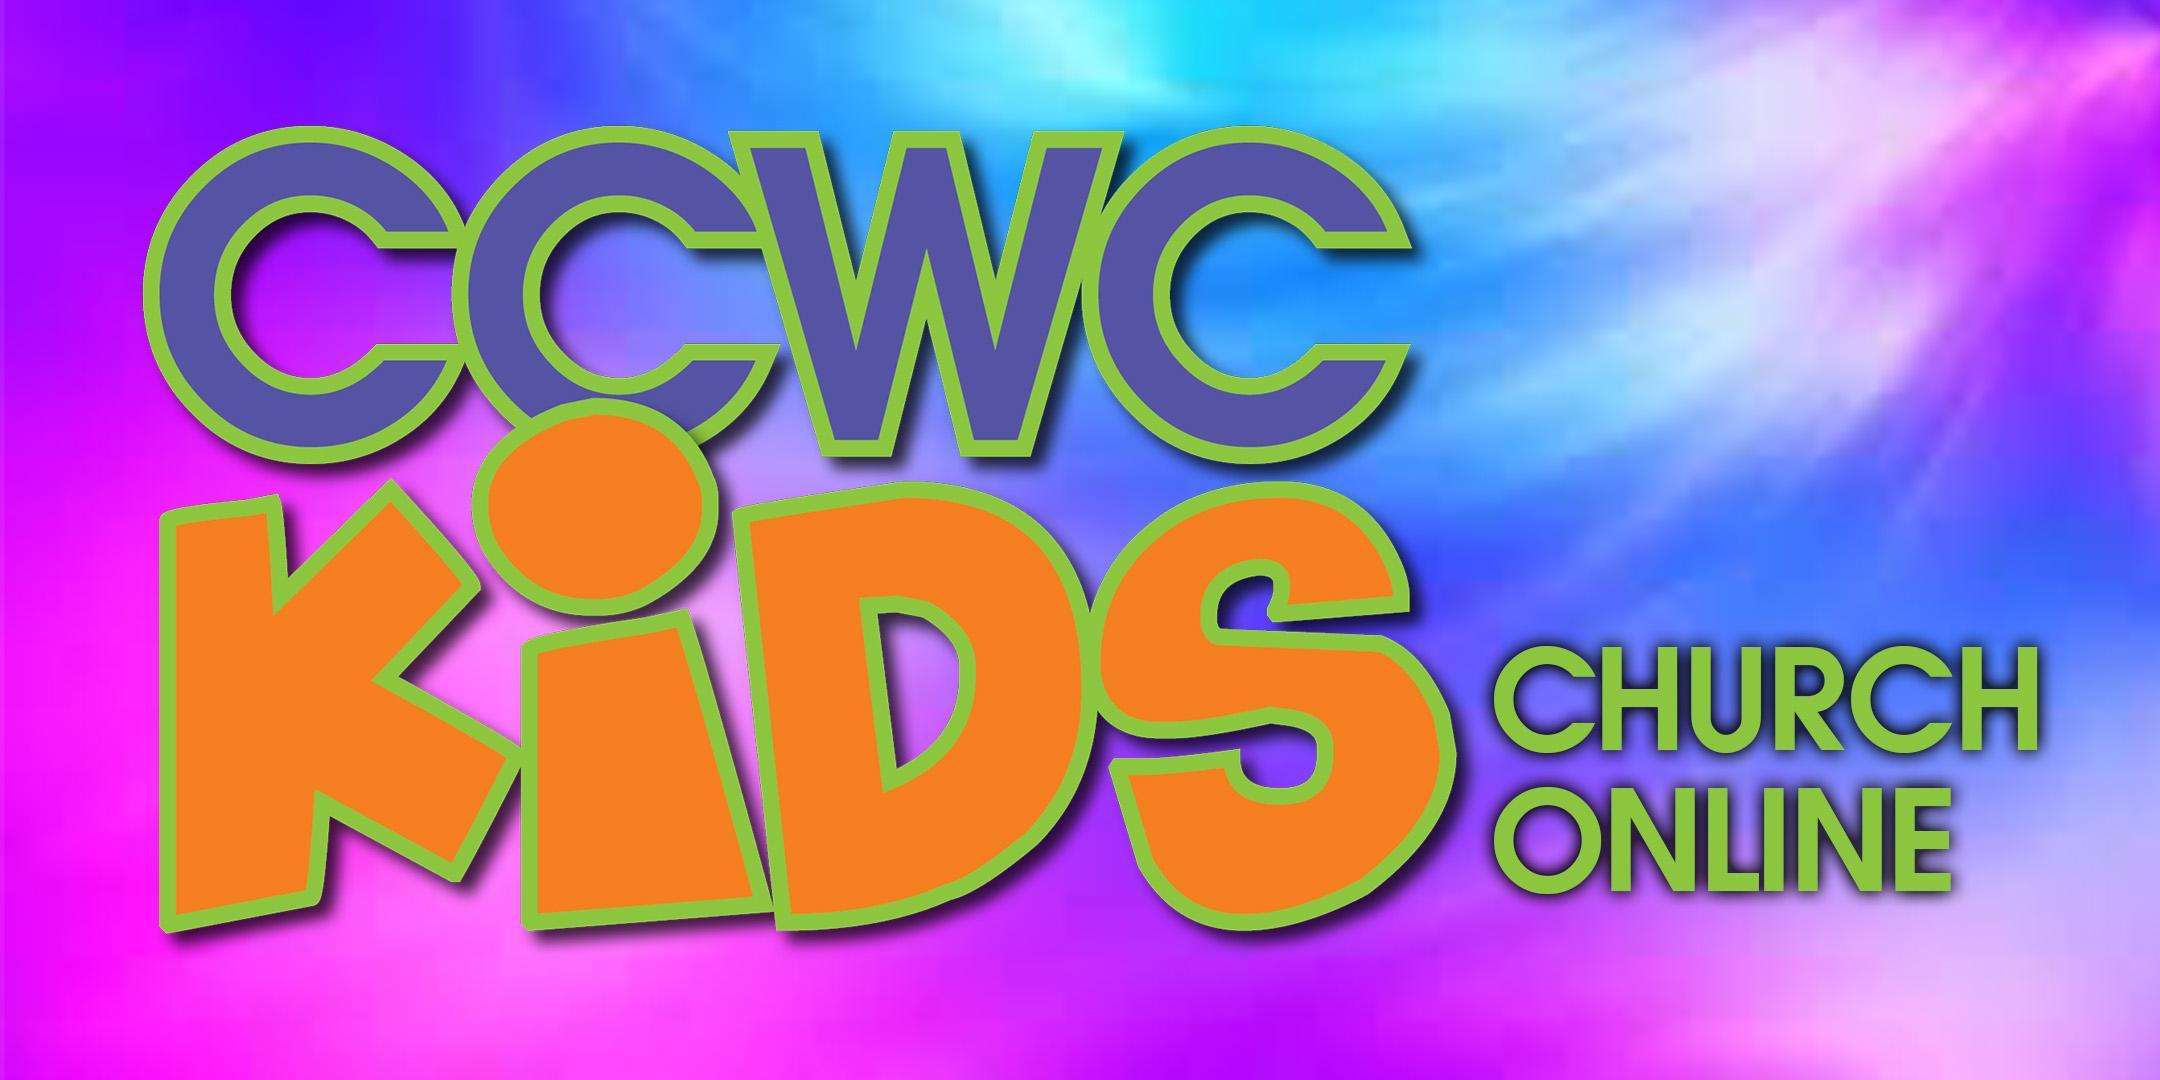 CCWC Kids Church Online CCWCstudents.org